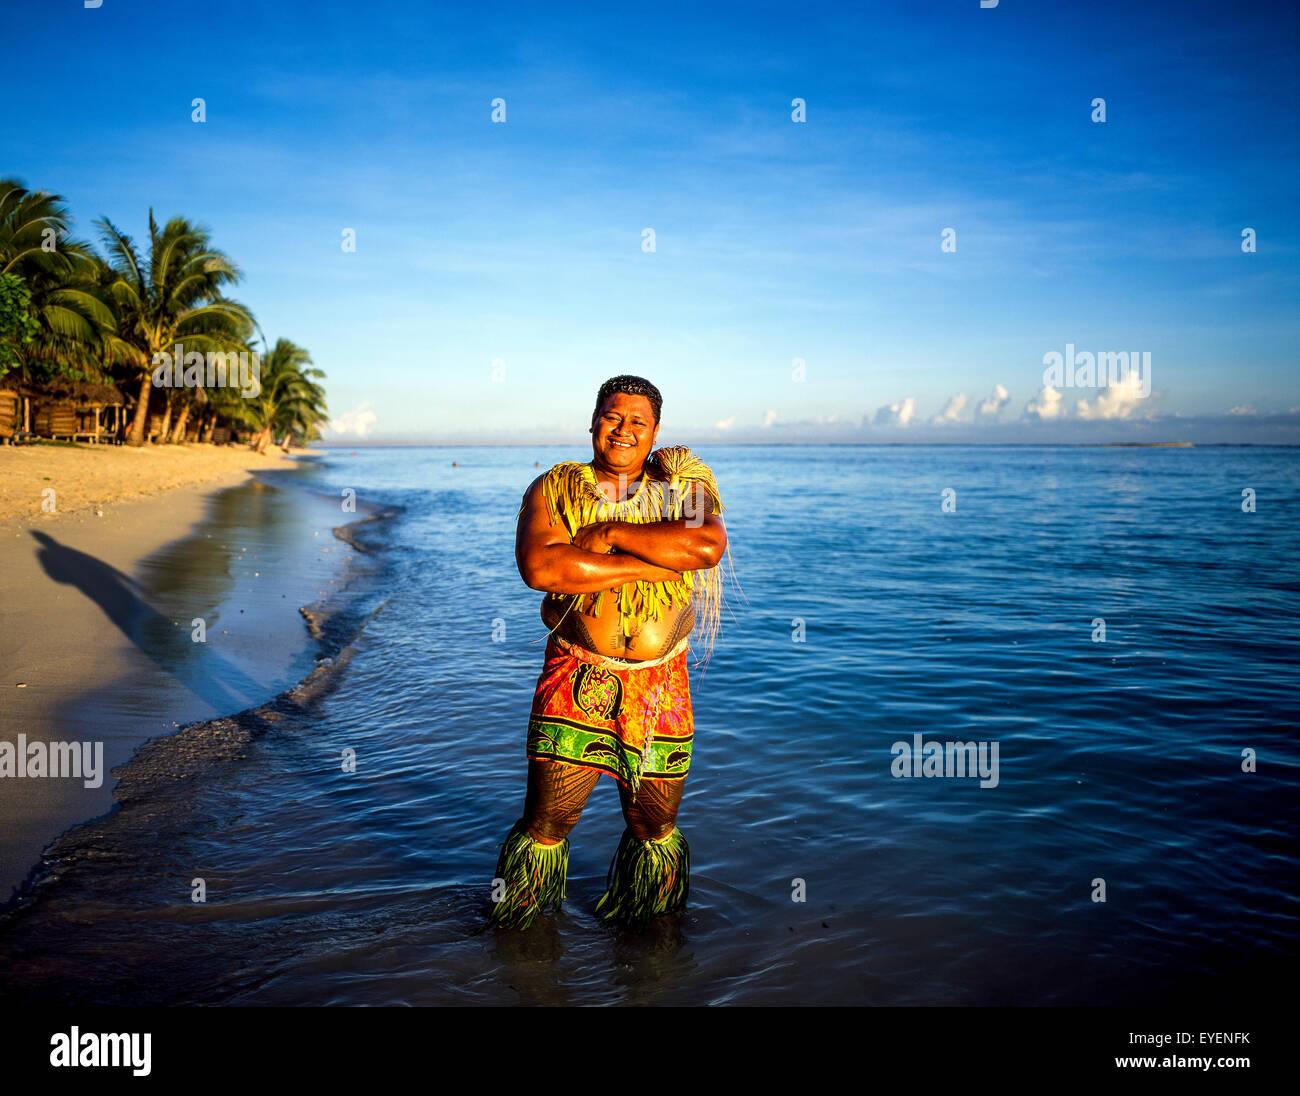 Samoa Beaches: Savaii Island Stock Photos & Savaii Island Stock Images